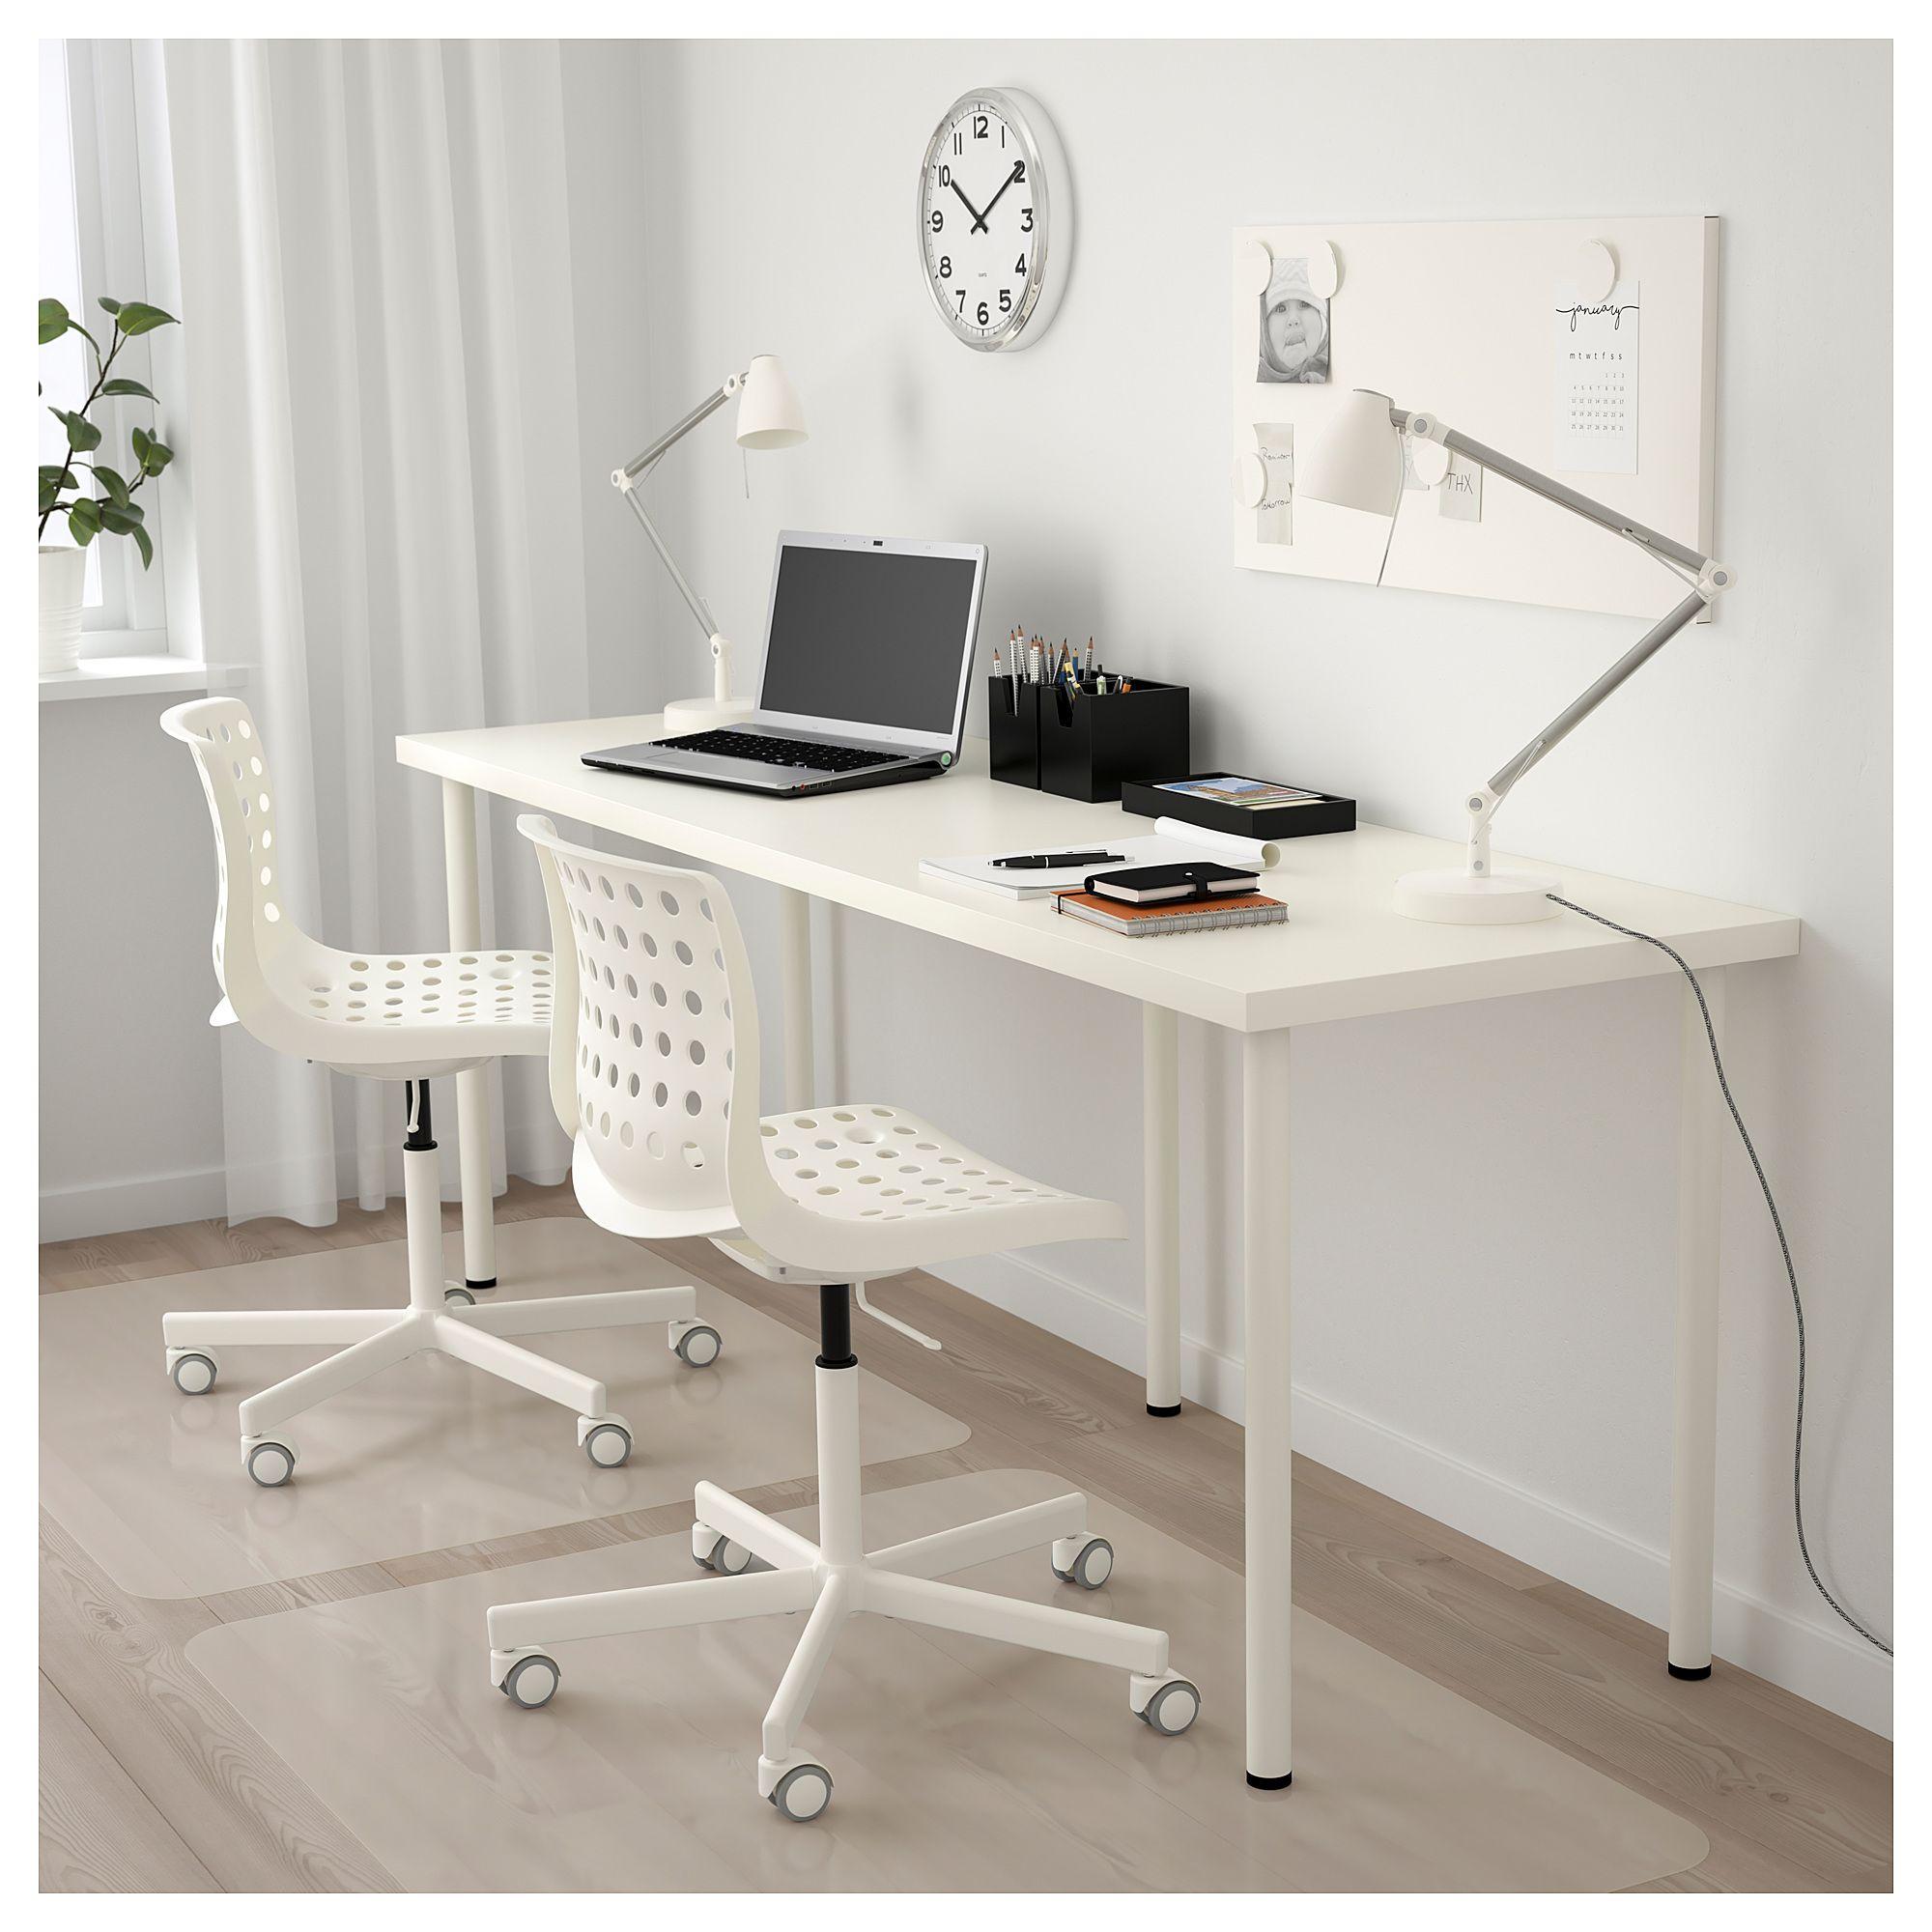 Linnmon Alex Table Blanc 200x60 Cm Ikea In 2020 Ikea Ikea Desk Linnmon Table Top